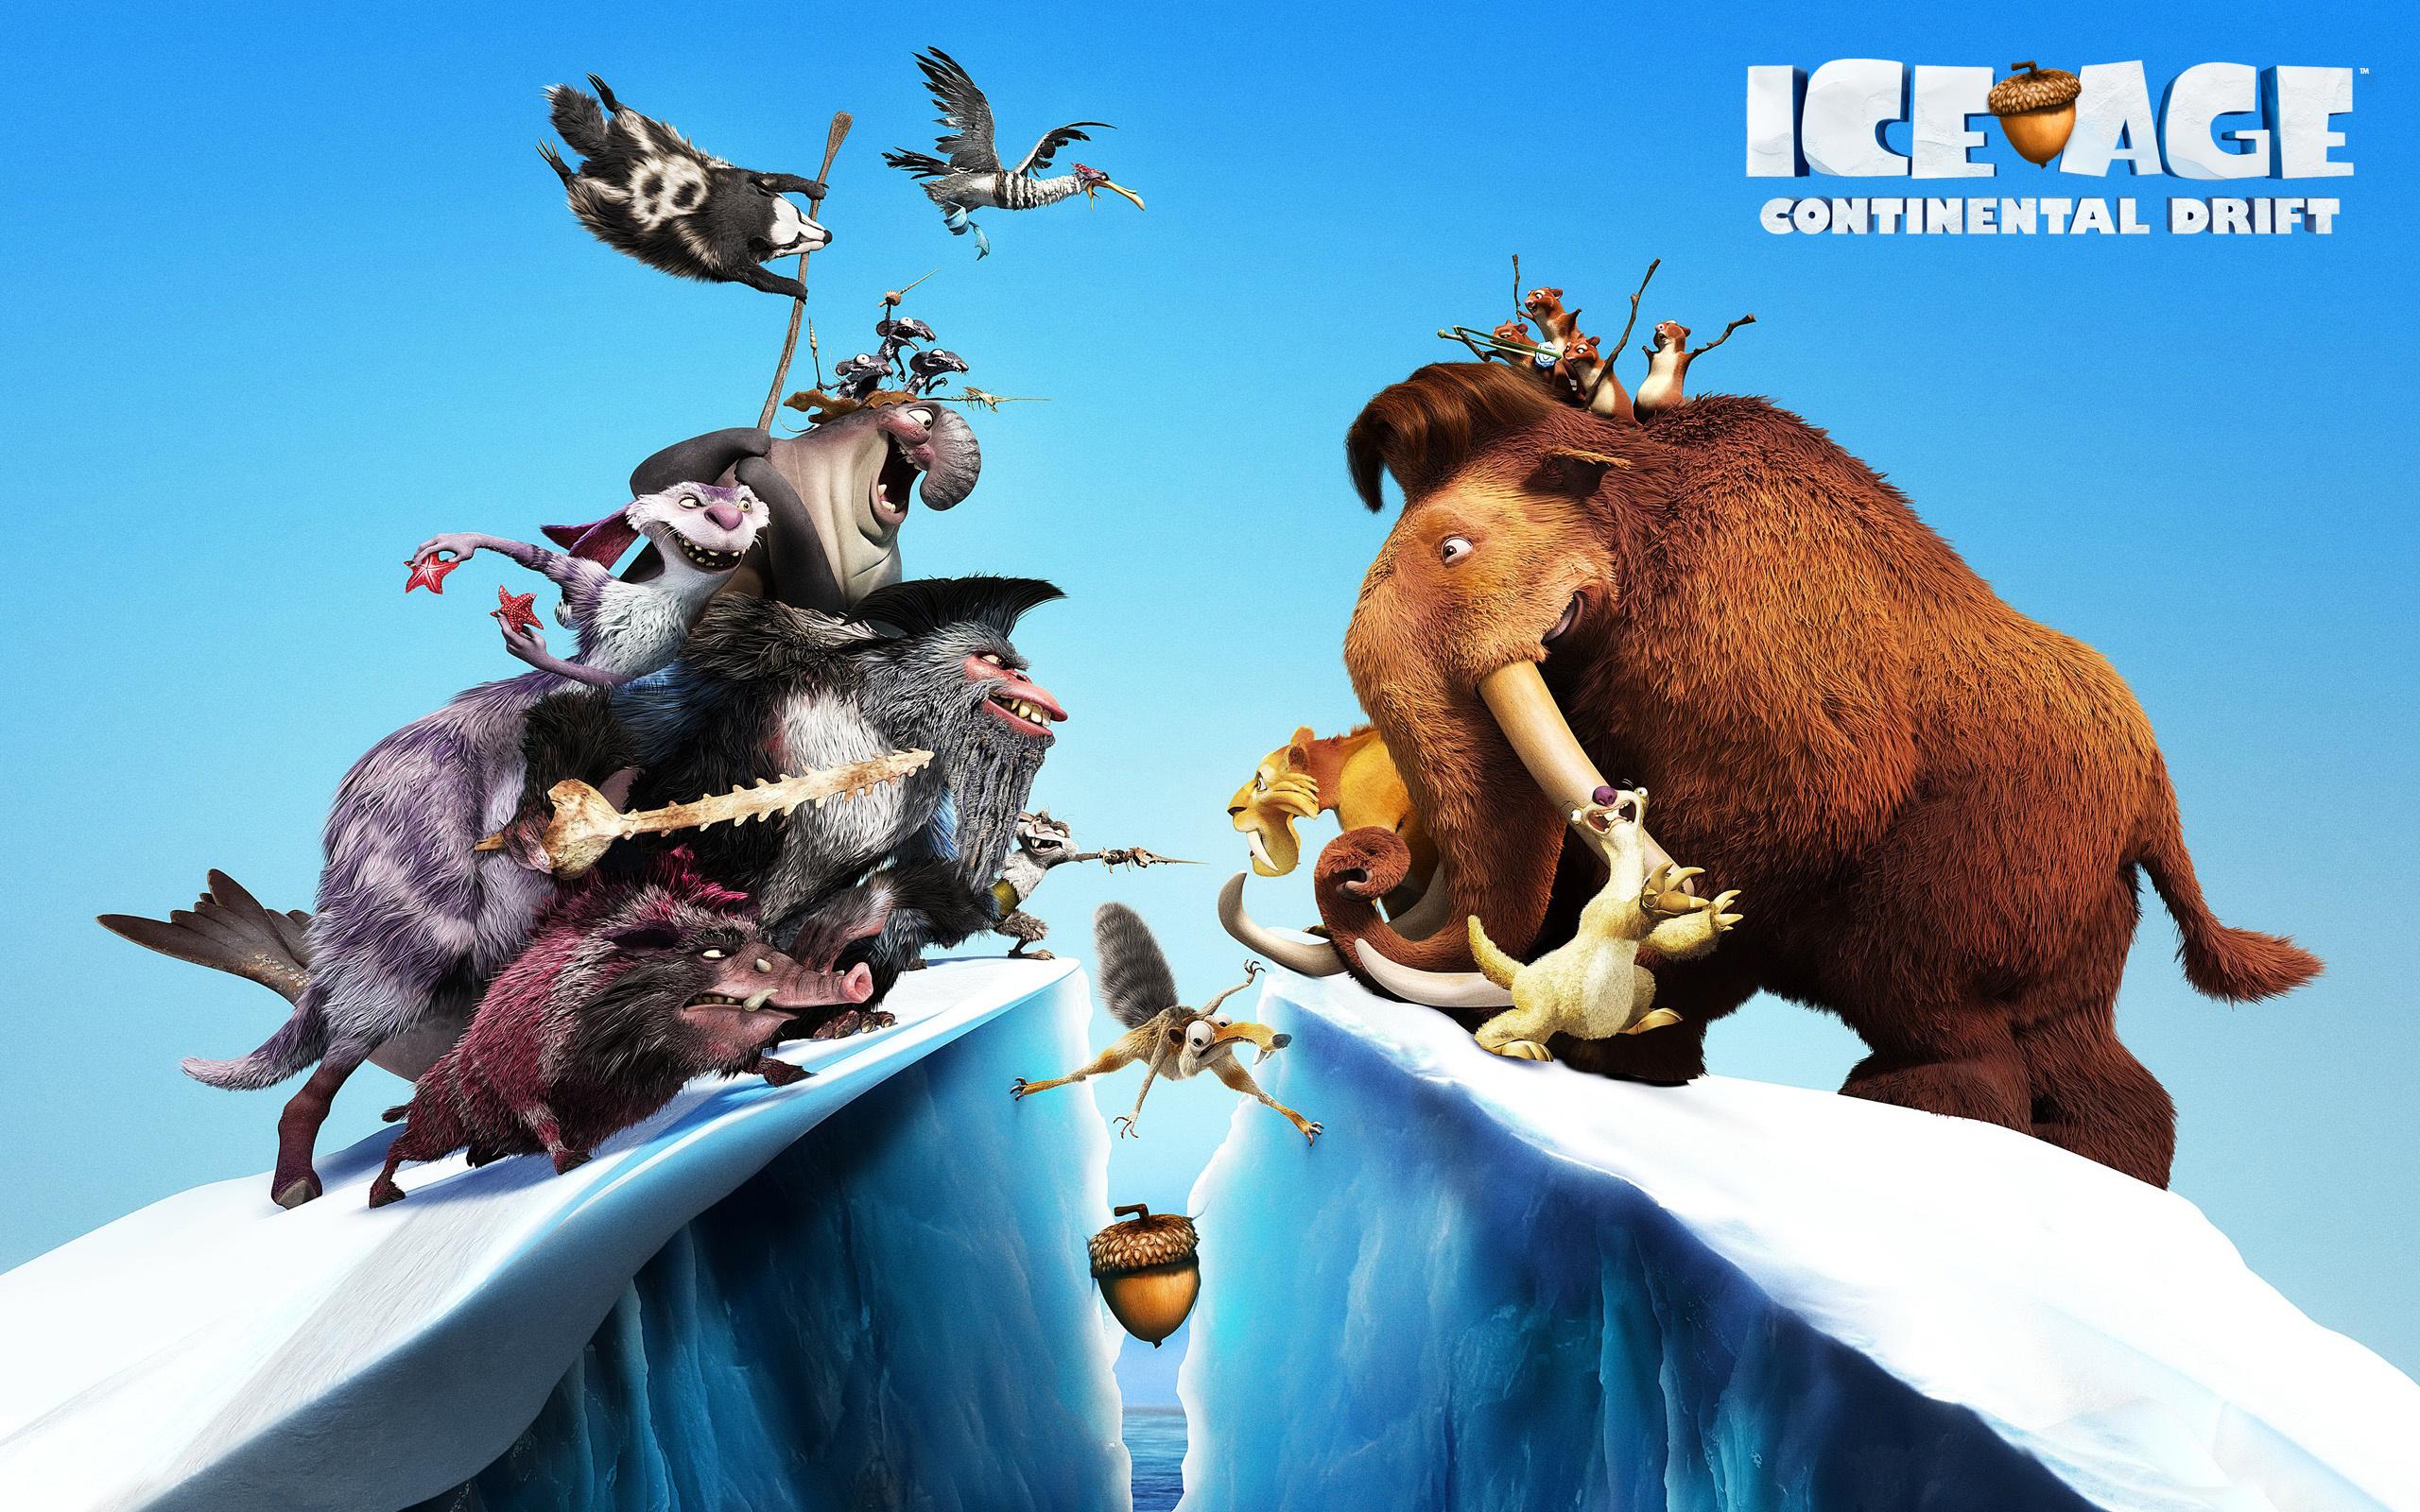 animal ice age 4 wallpaper